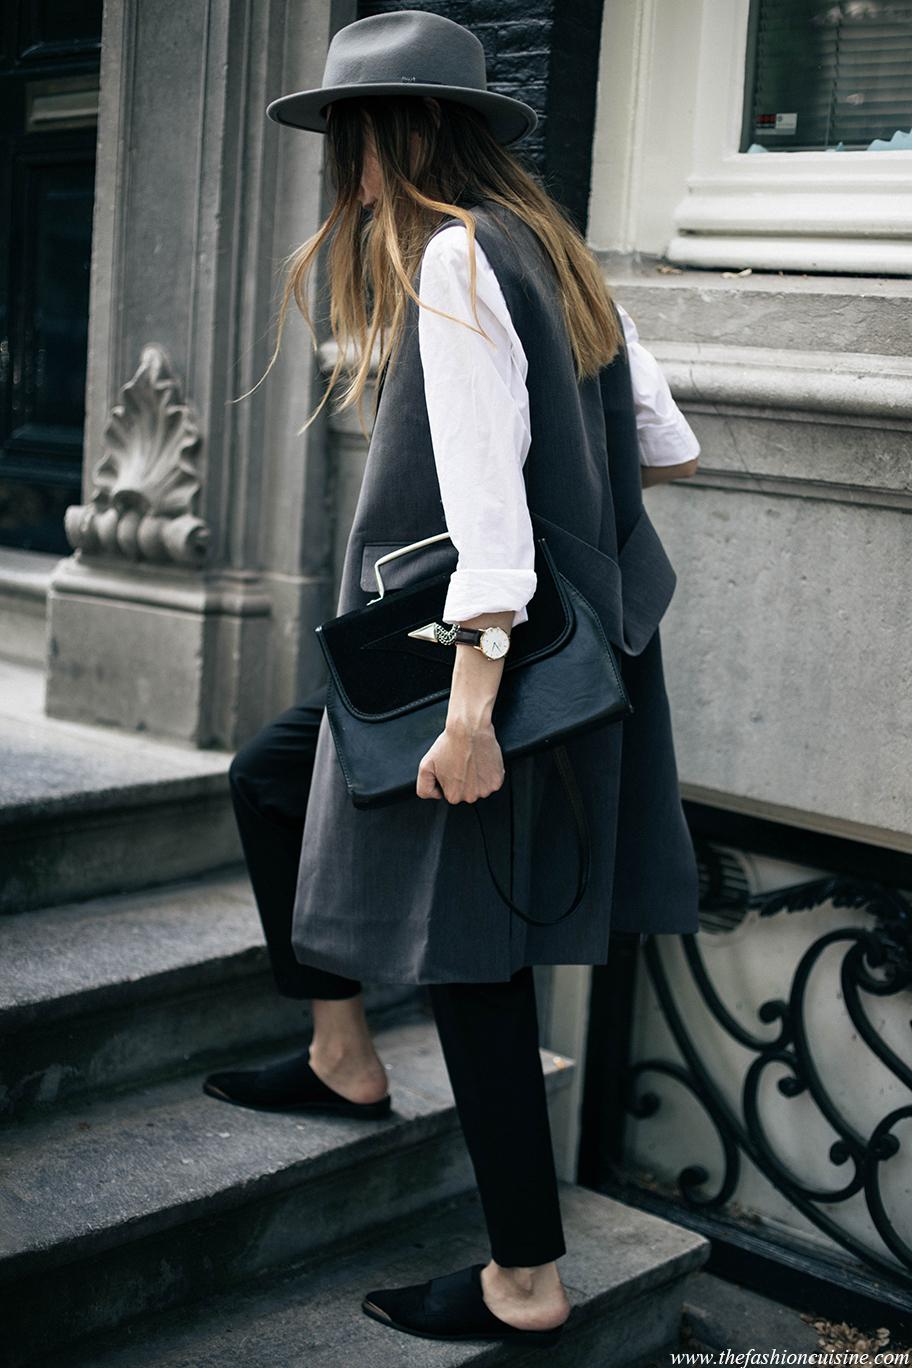 thời trang phụ nữ tuổi 30 8